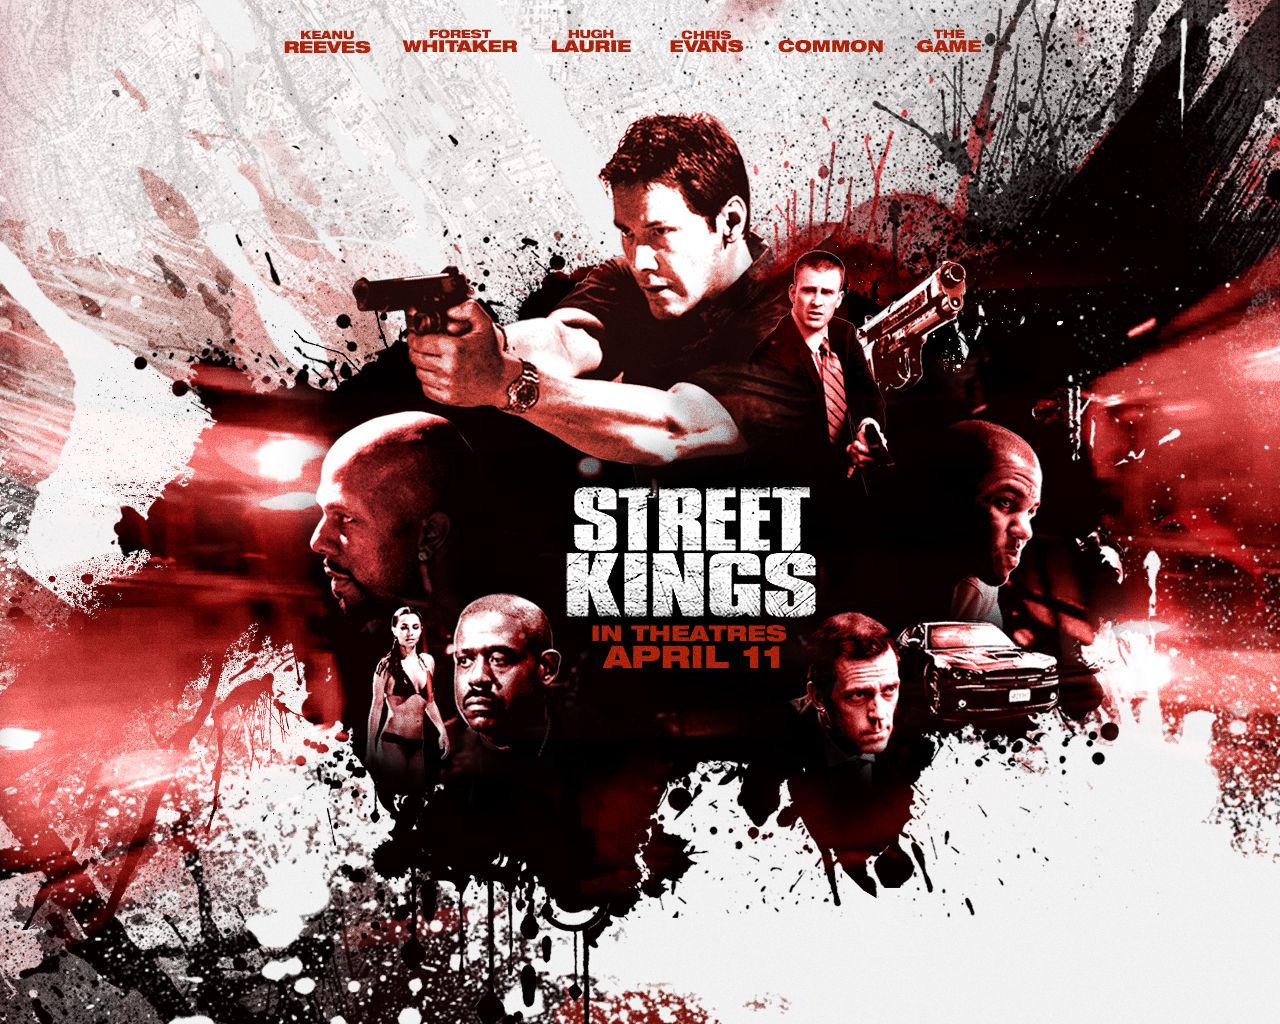 Review of movie street kings